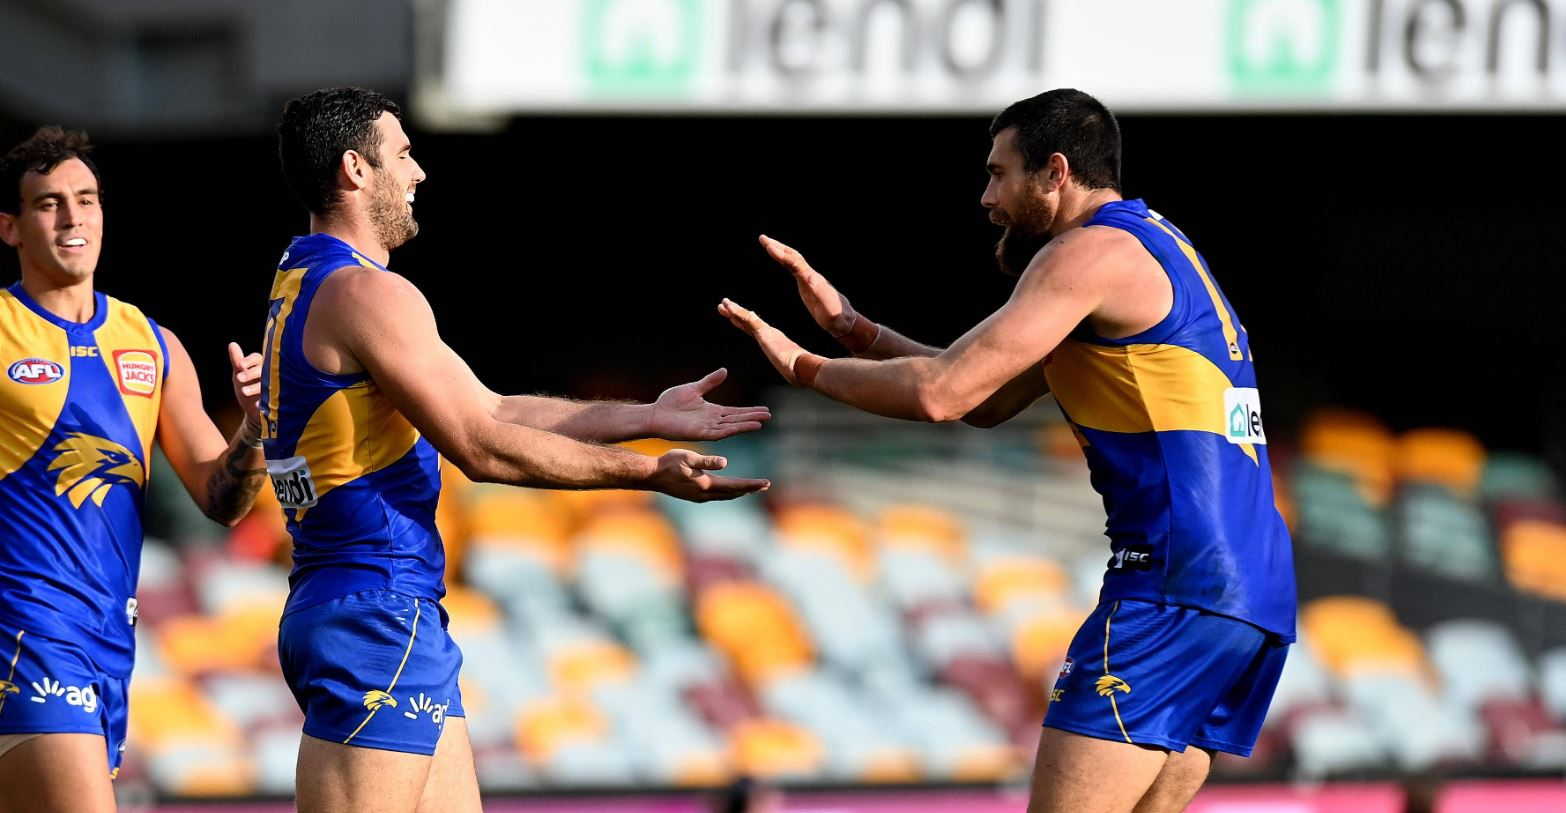 AFL 2020 Daily Fantasy Tips: Round 8 - Sunday